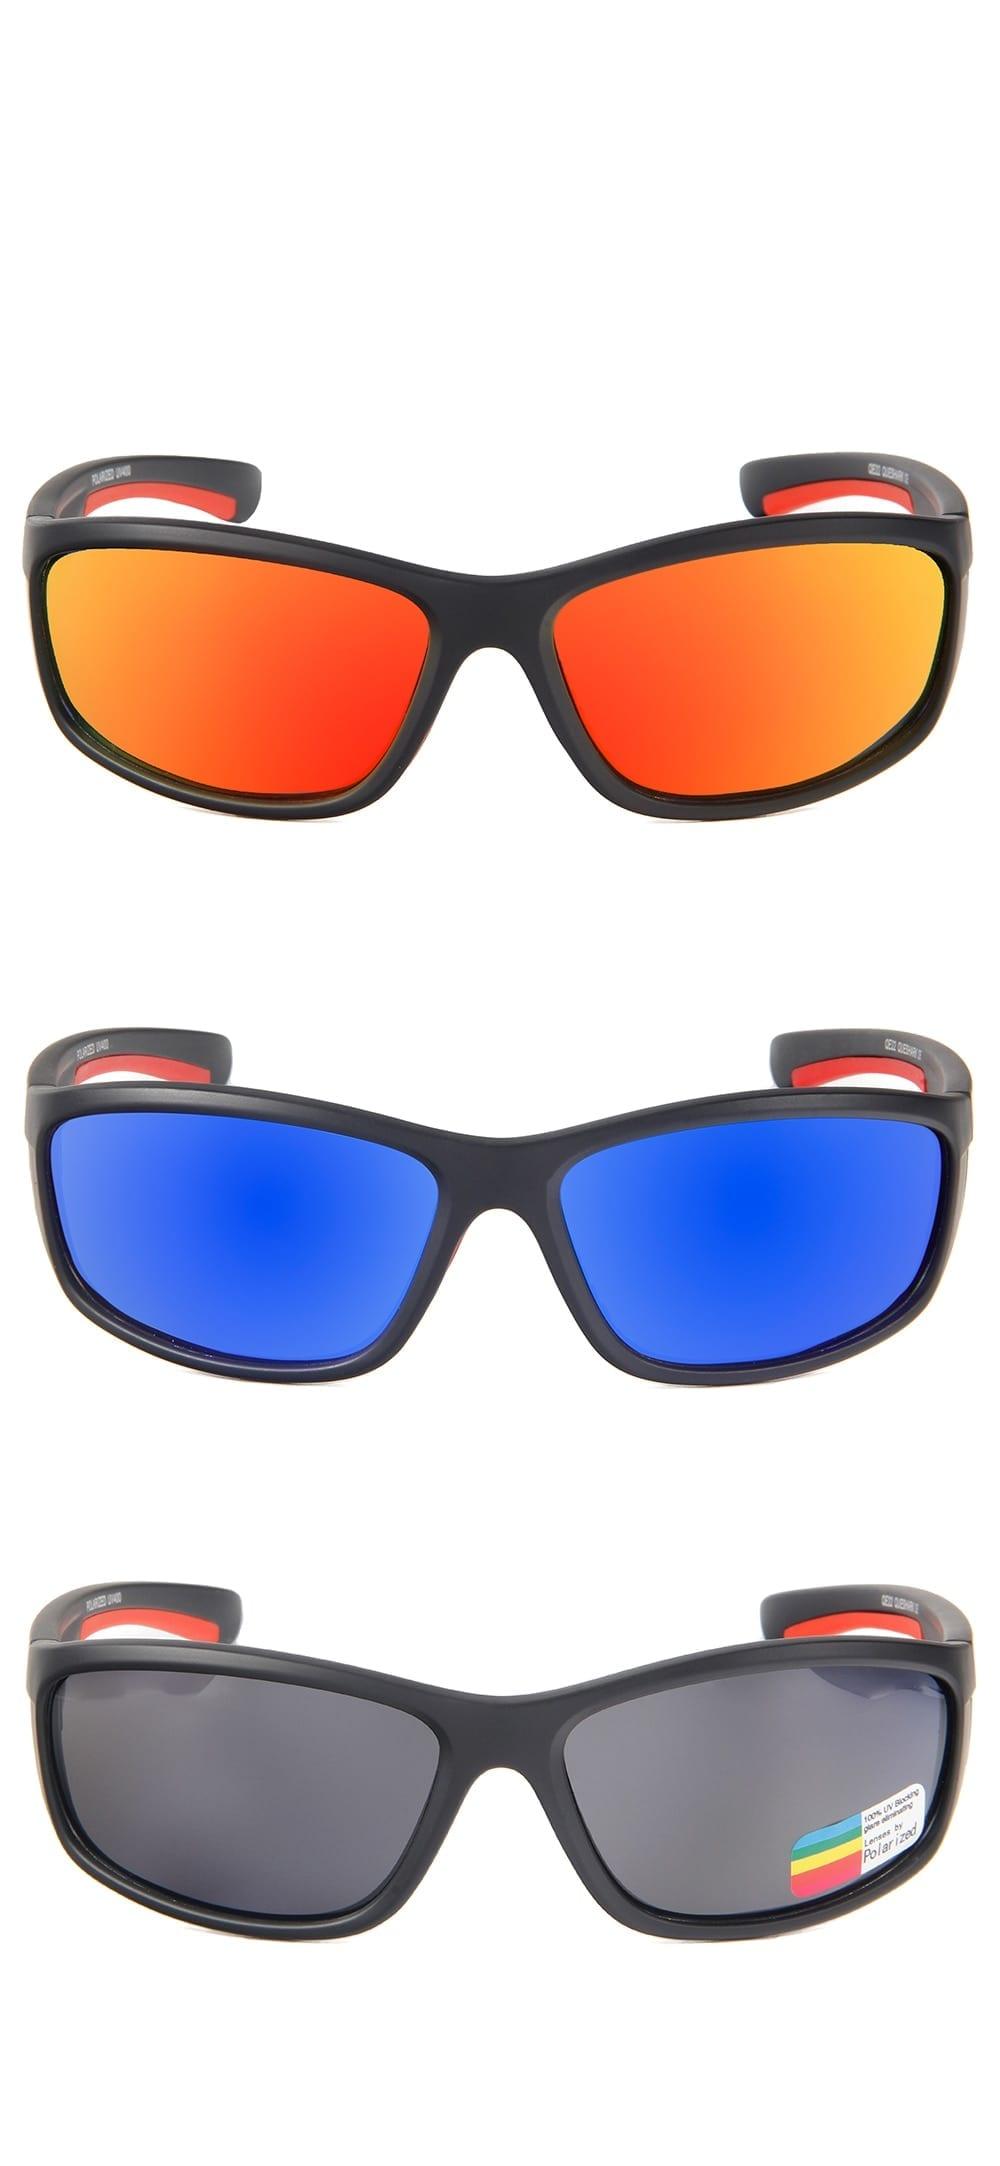 Men's Polarized Fishing Sunglasses with Case